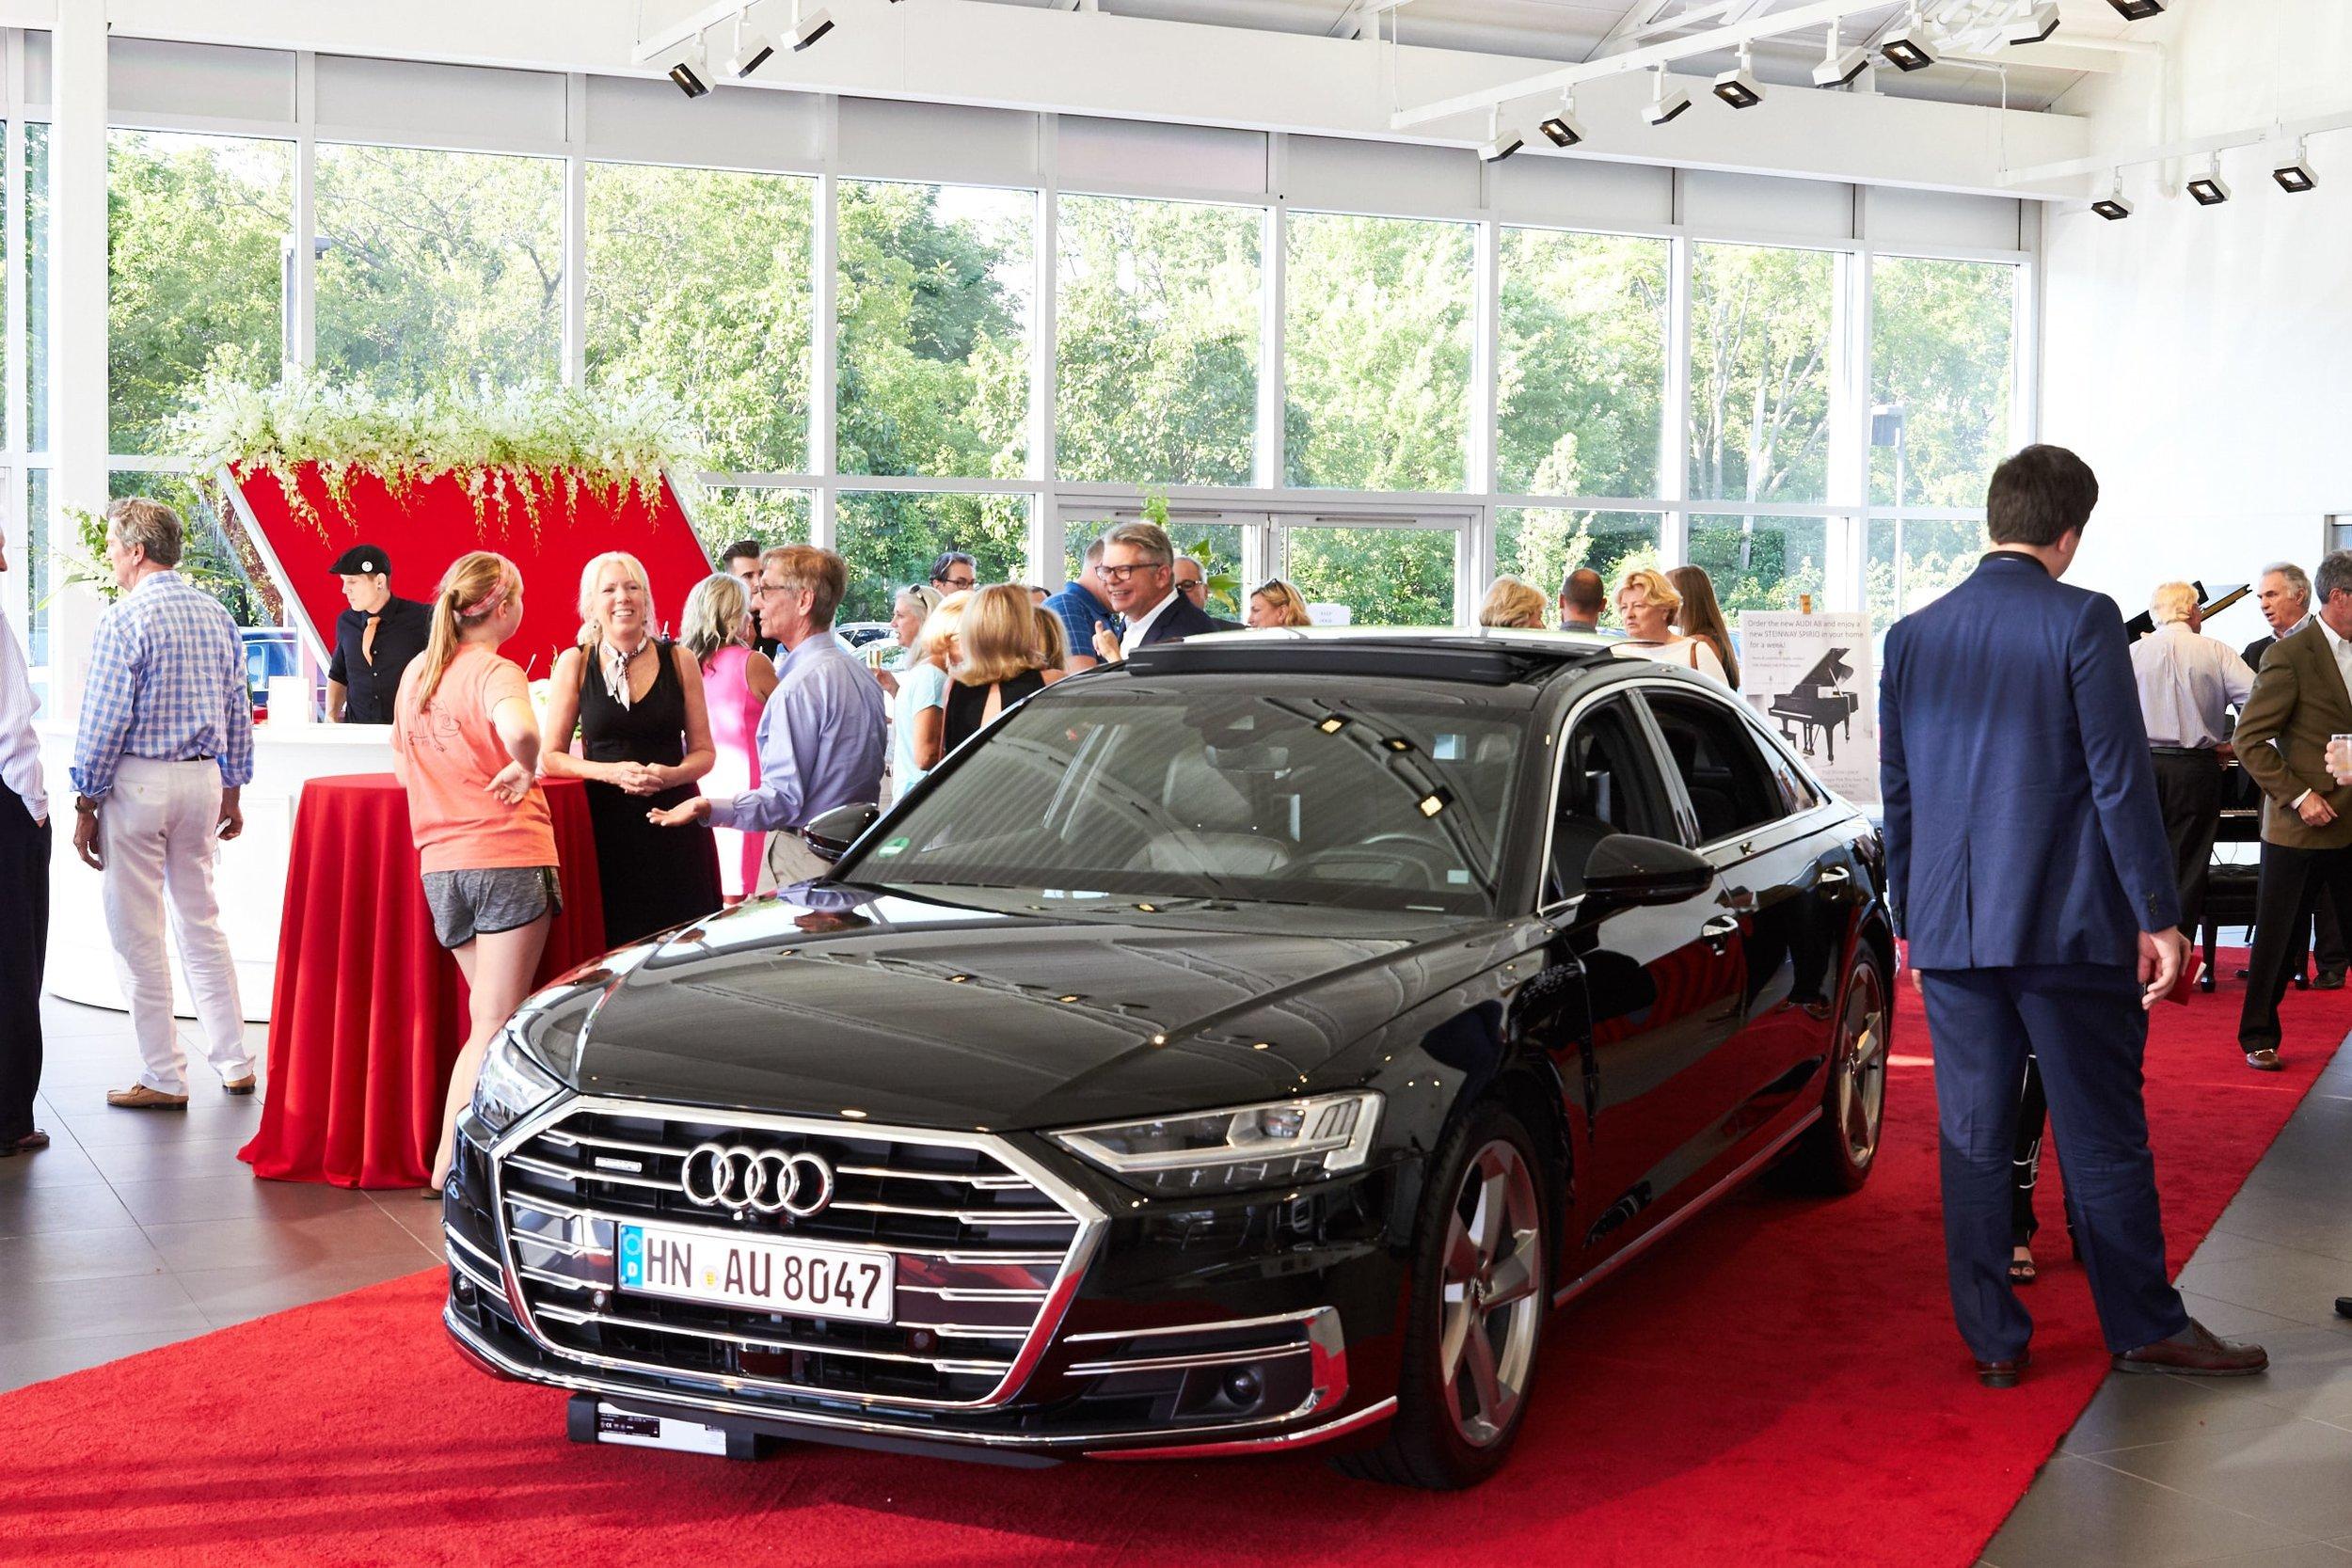 Audi(92of174)-min.JPG